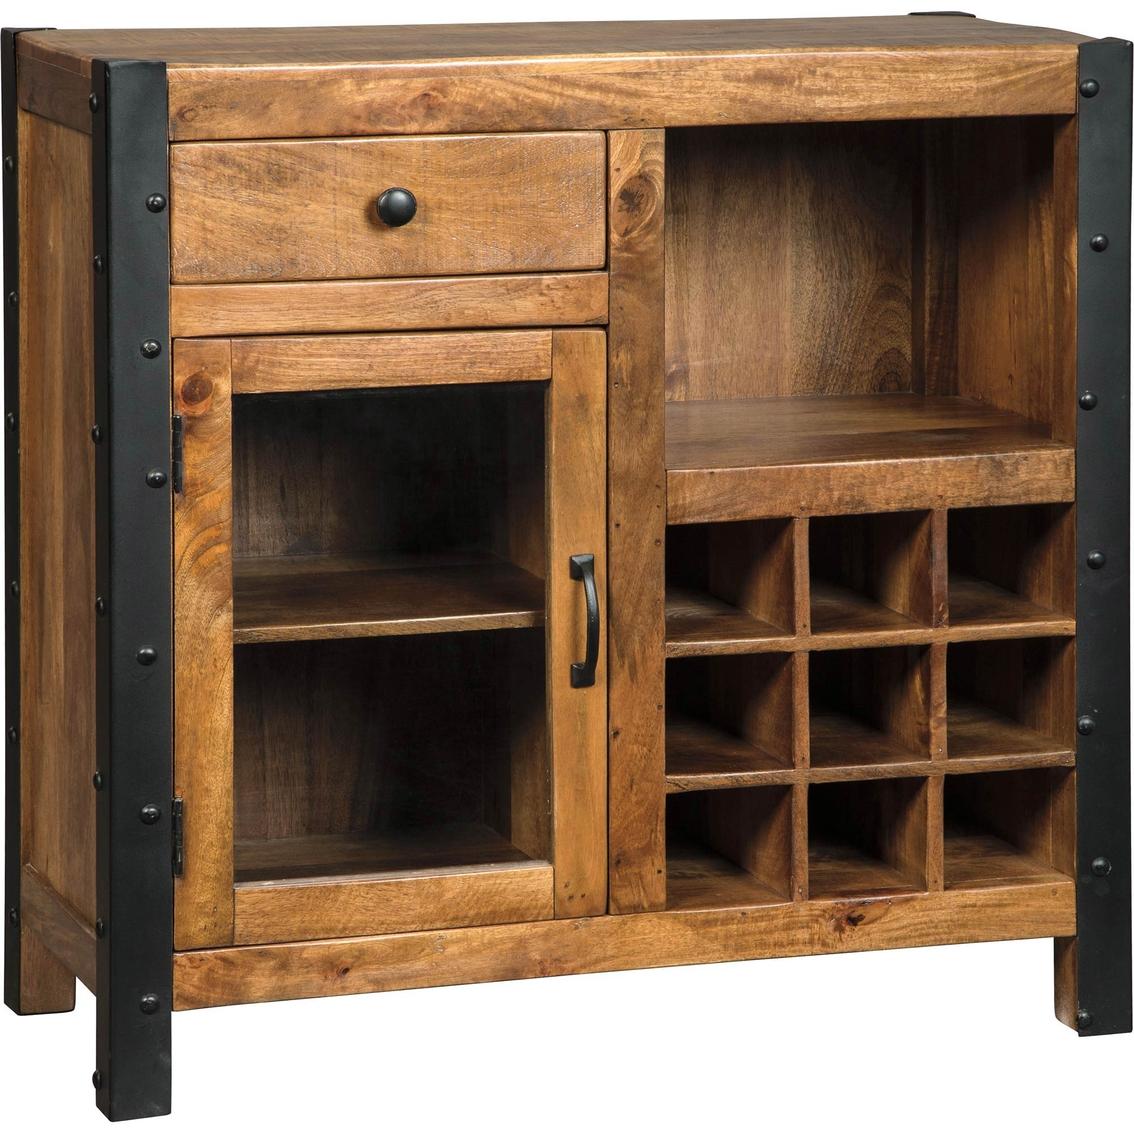 Ashley Furniture Glosco Kitchen Hutch: Signature Design By Ashley Glosco Wine Cabinet With Door